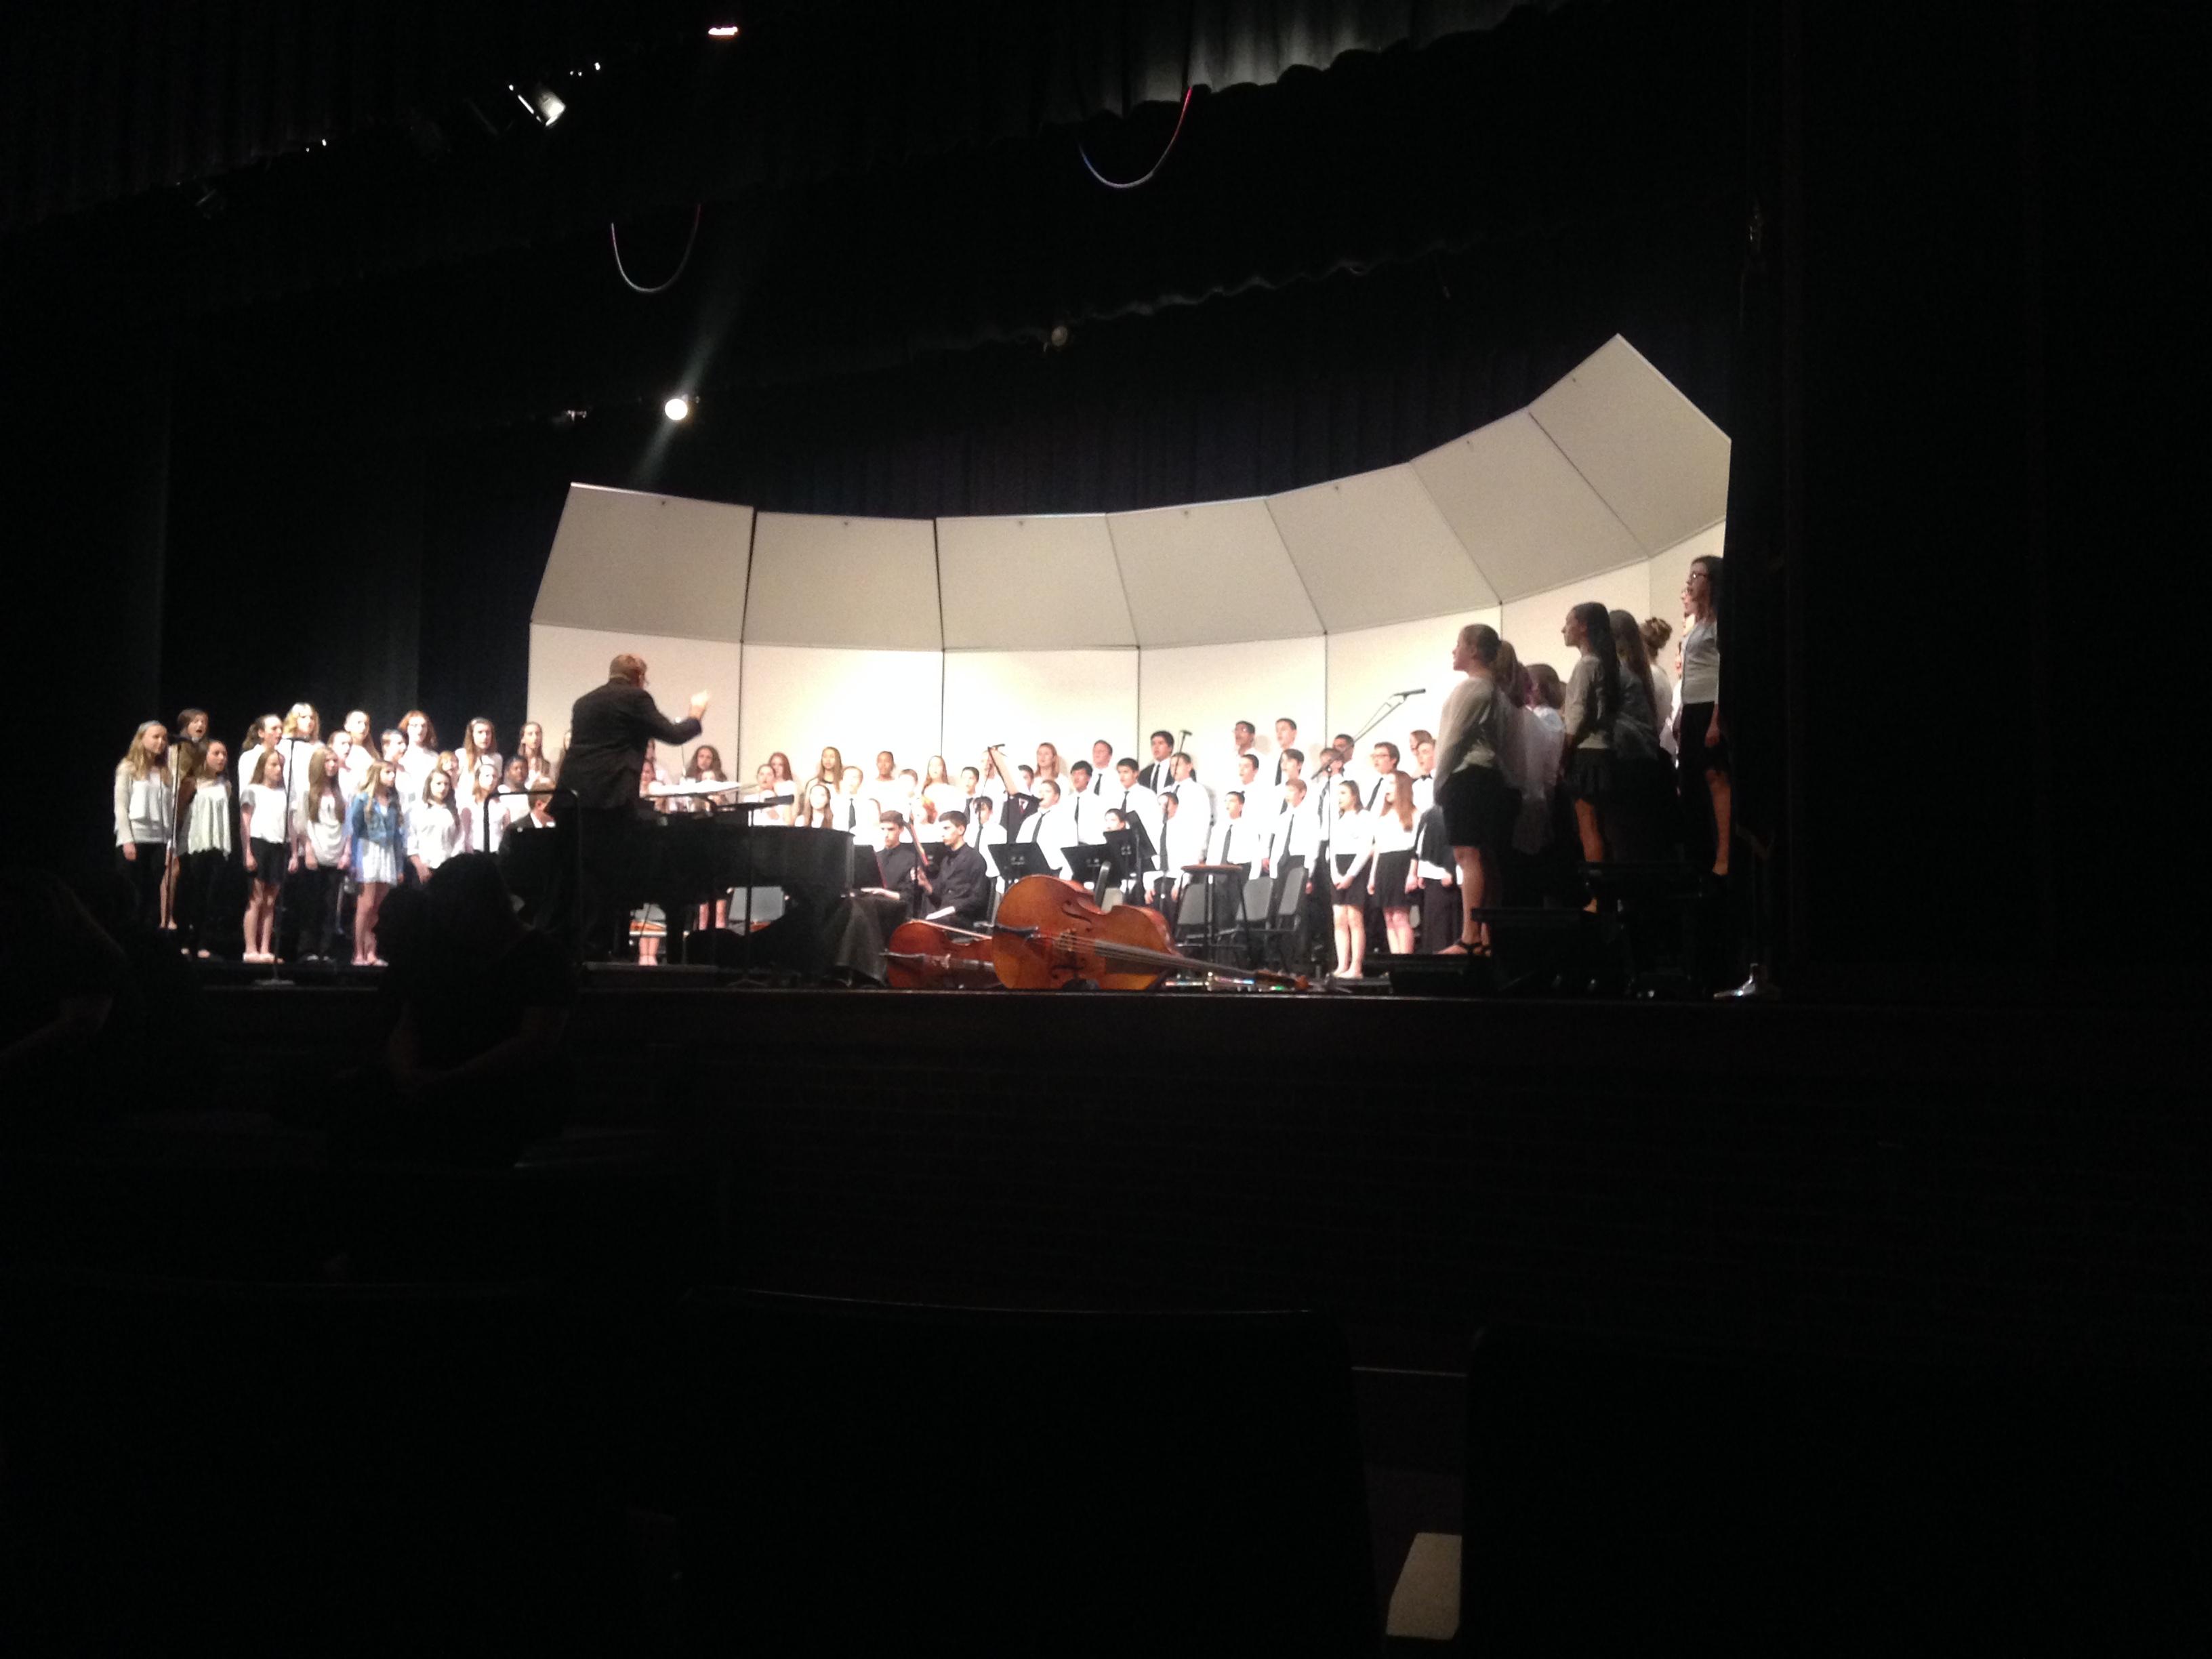 The choir concert took place in Susquehannock High School's auditorium.